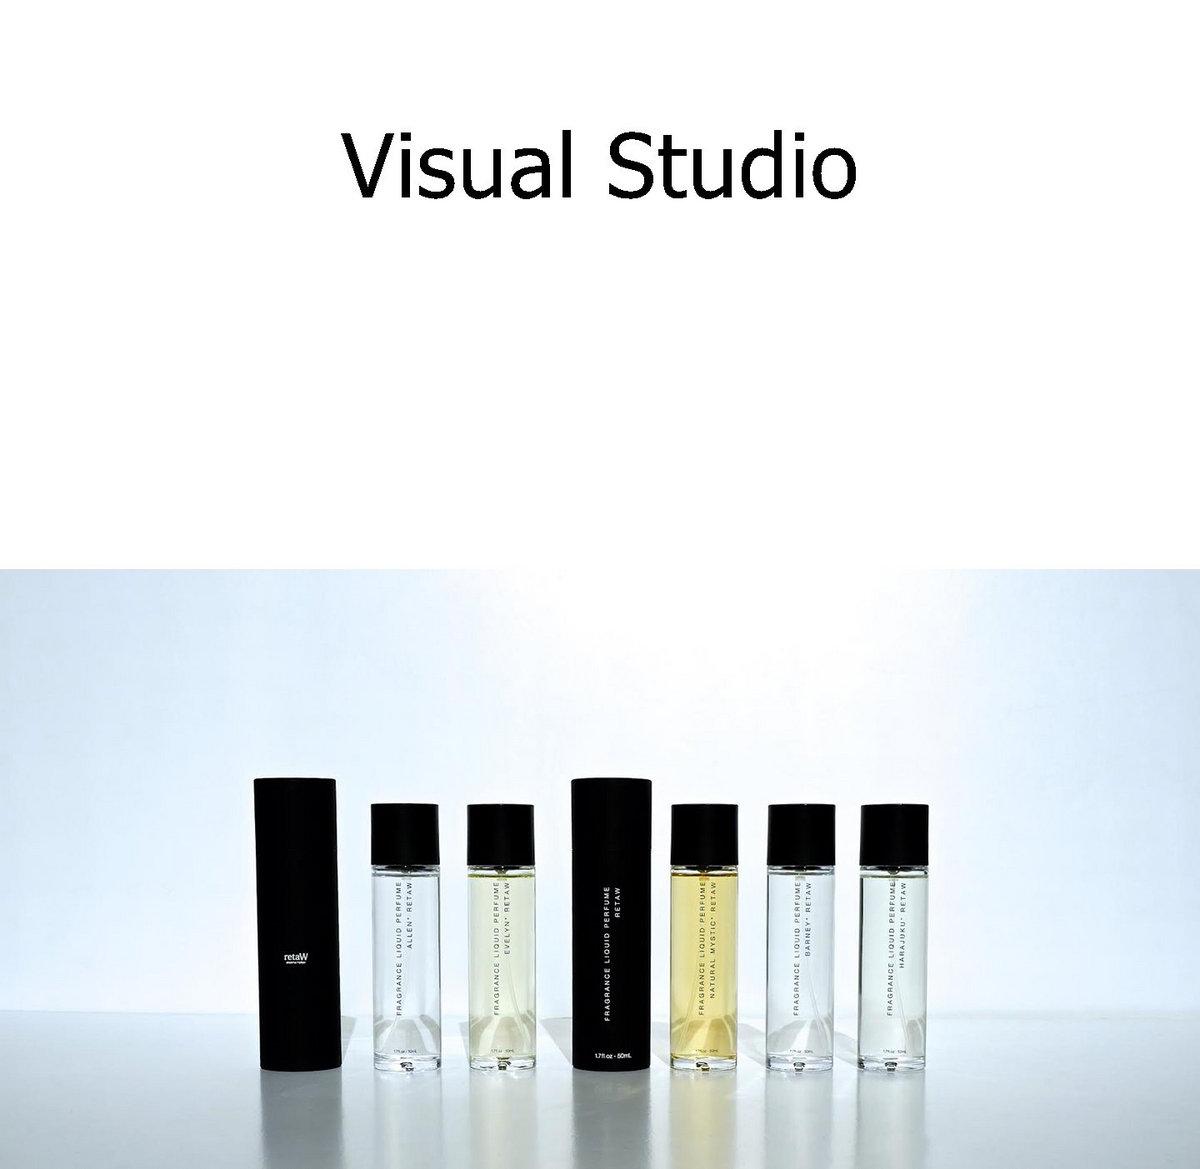 8 installer) Visual Studio download 10 11 6